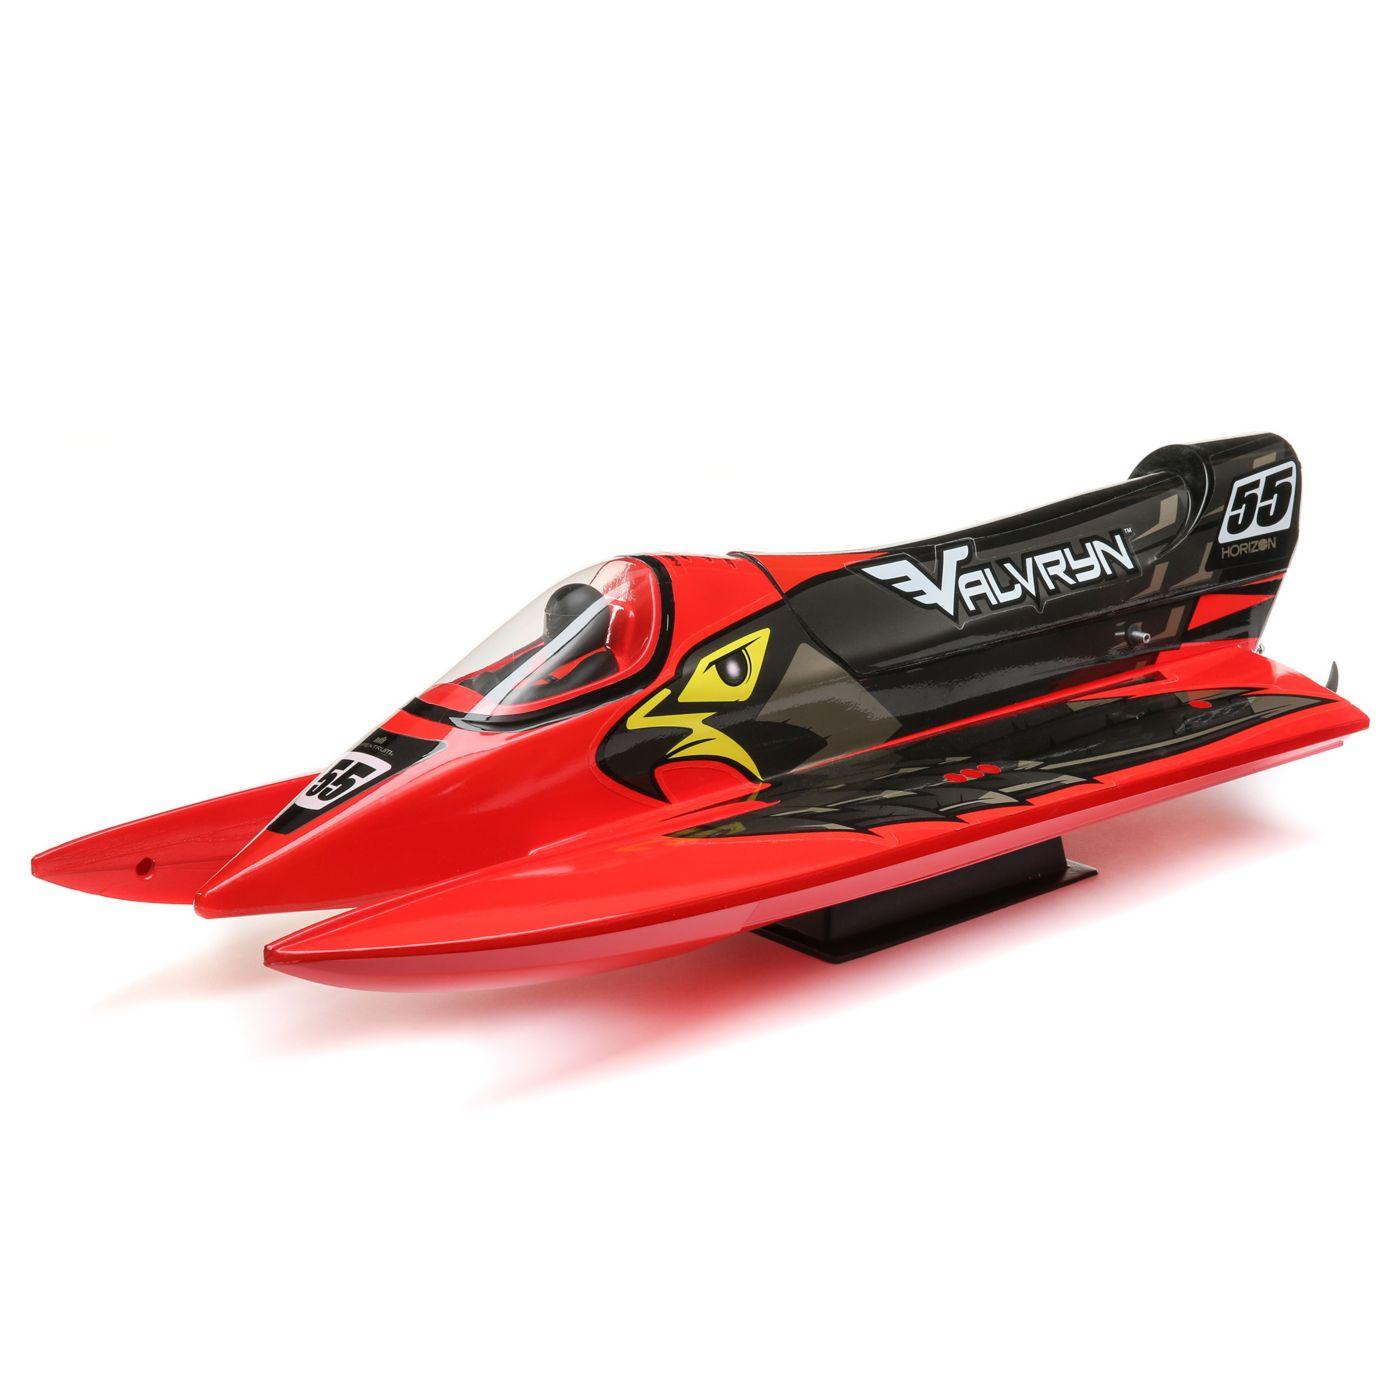 "The ""Self-Righting"" Stuff: The Pro Boat Valvryn F1 RTR"